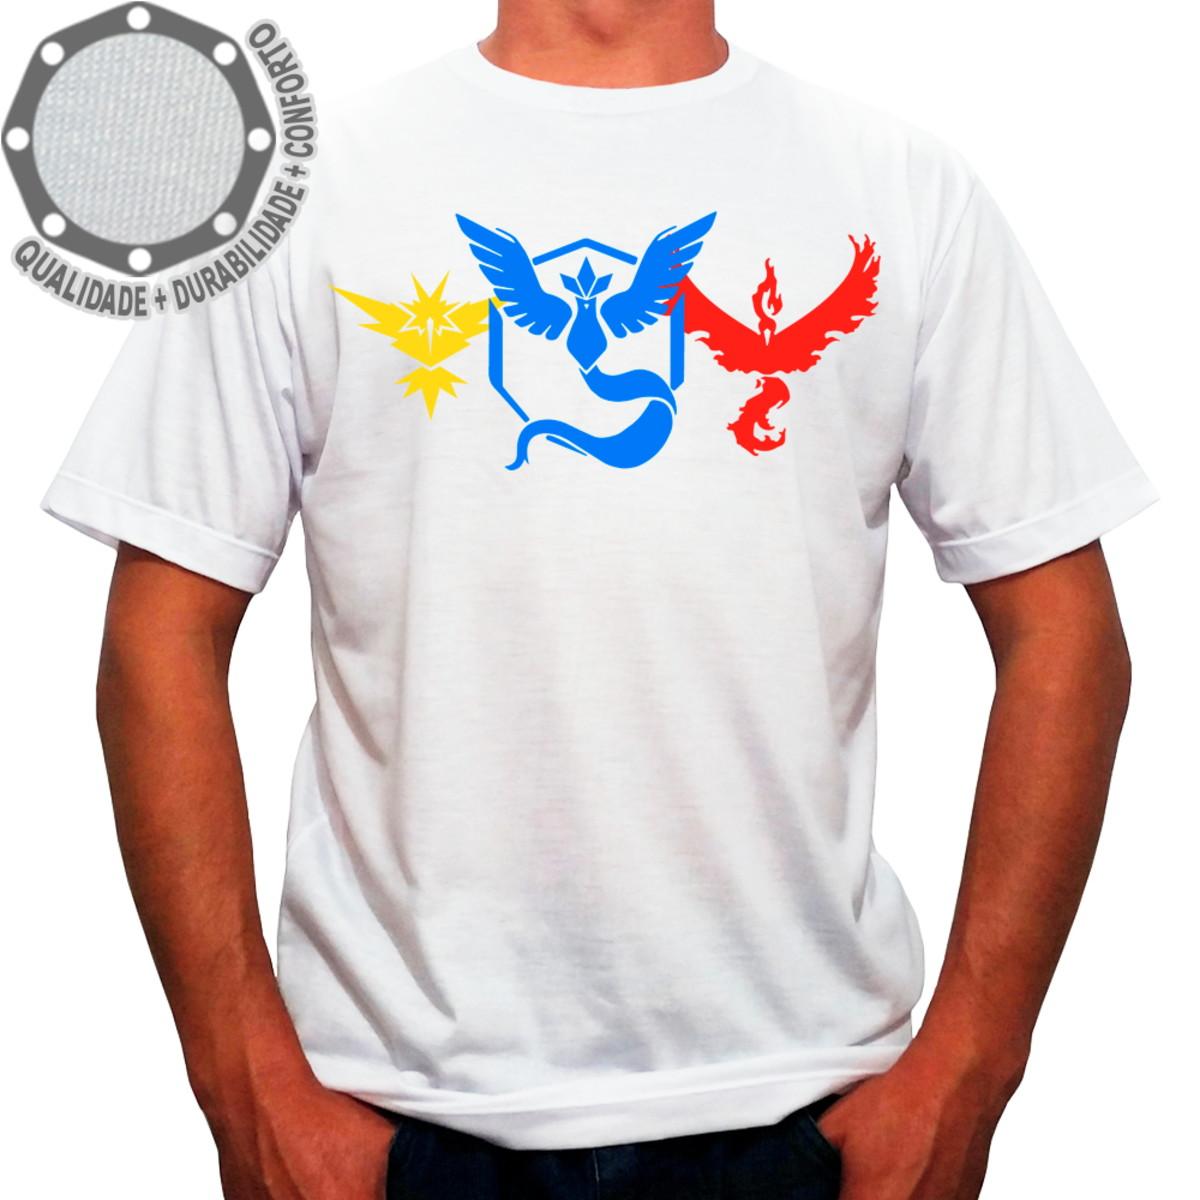 01ed31d706 Camiseta Pokémon Go Teams no Elo7